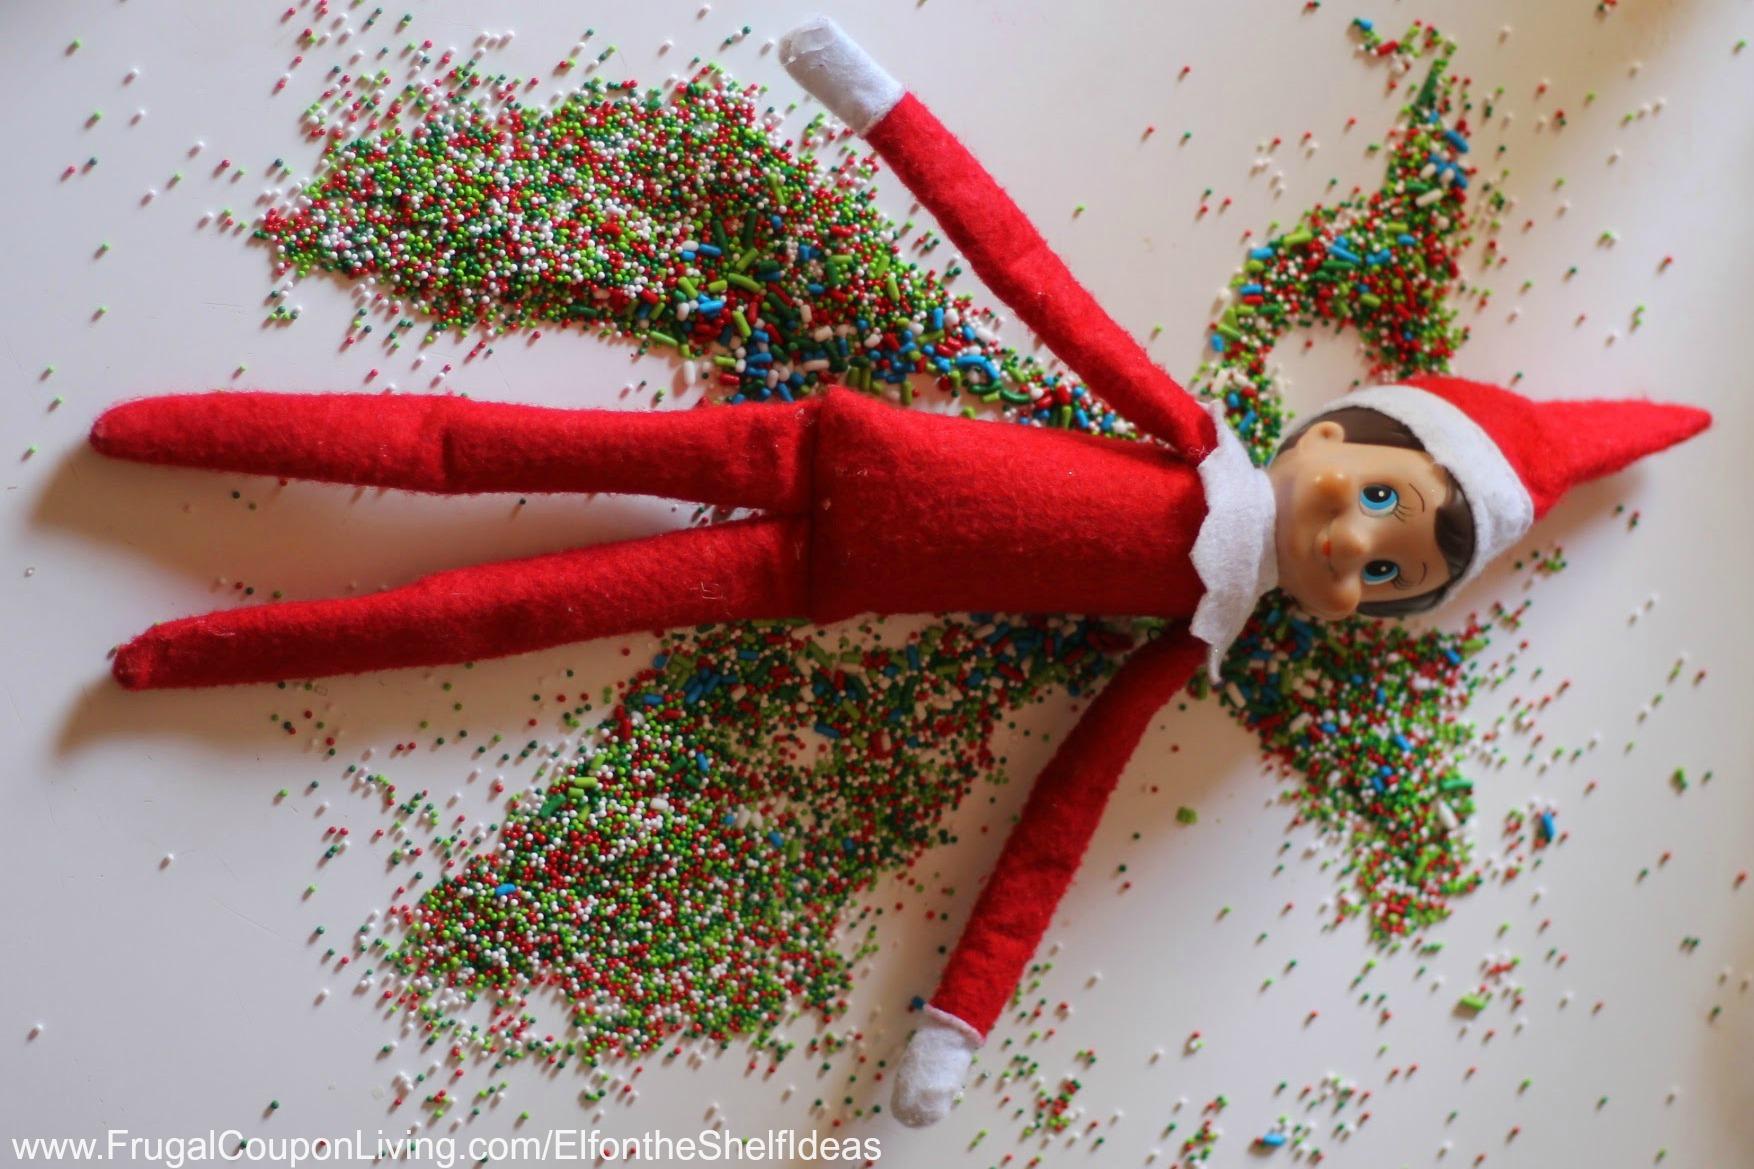 elf-on-the-shelf-ideas-sprinkle-angel-frugal-coupon-living